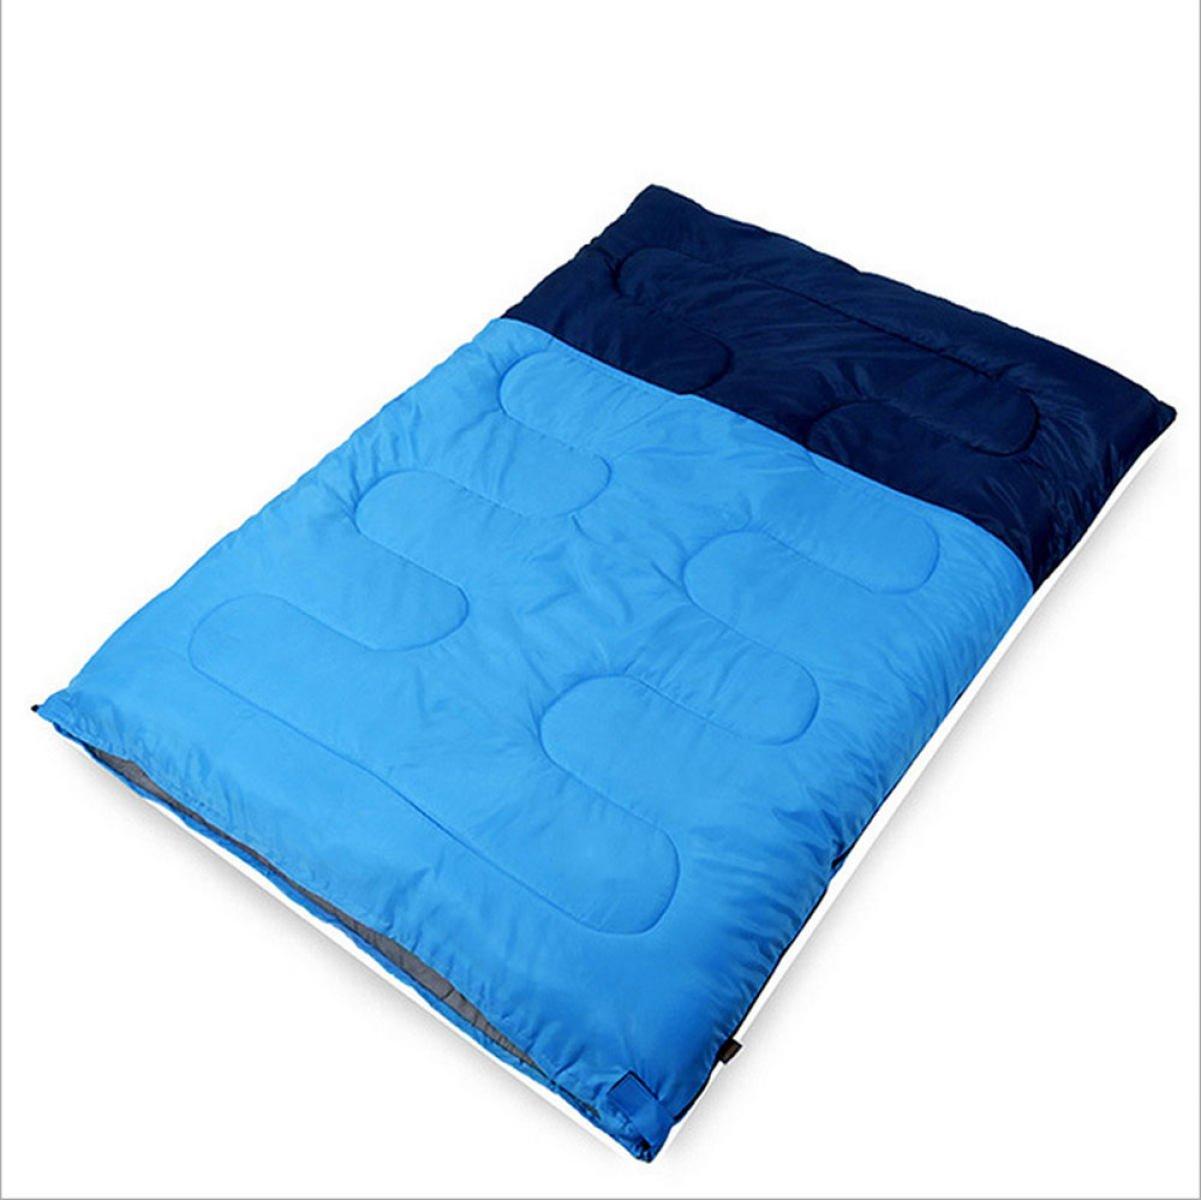 Bolsa De Dormir Sobre Engrosamiento Al Aire Libre Algodón Descanso ...